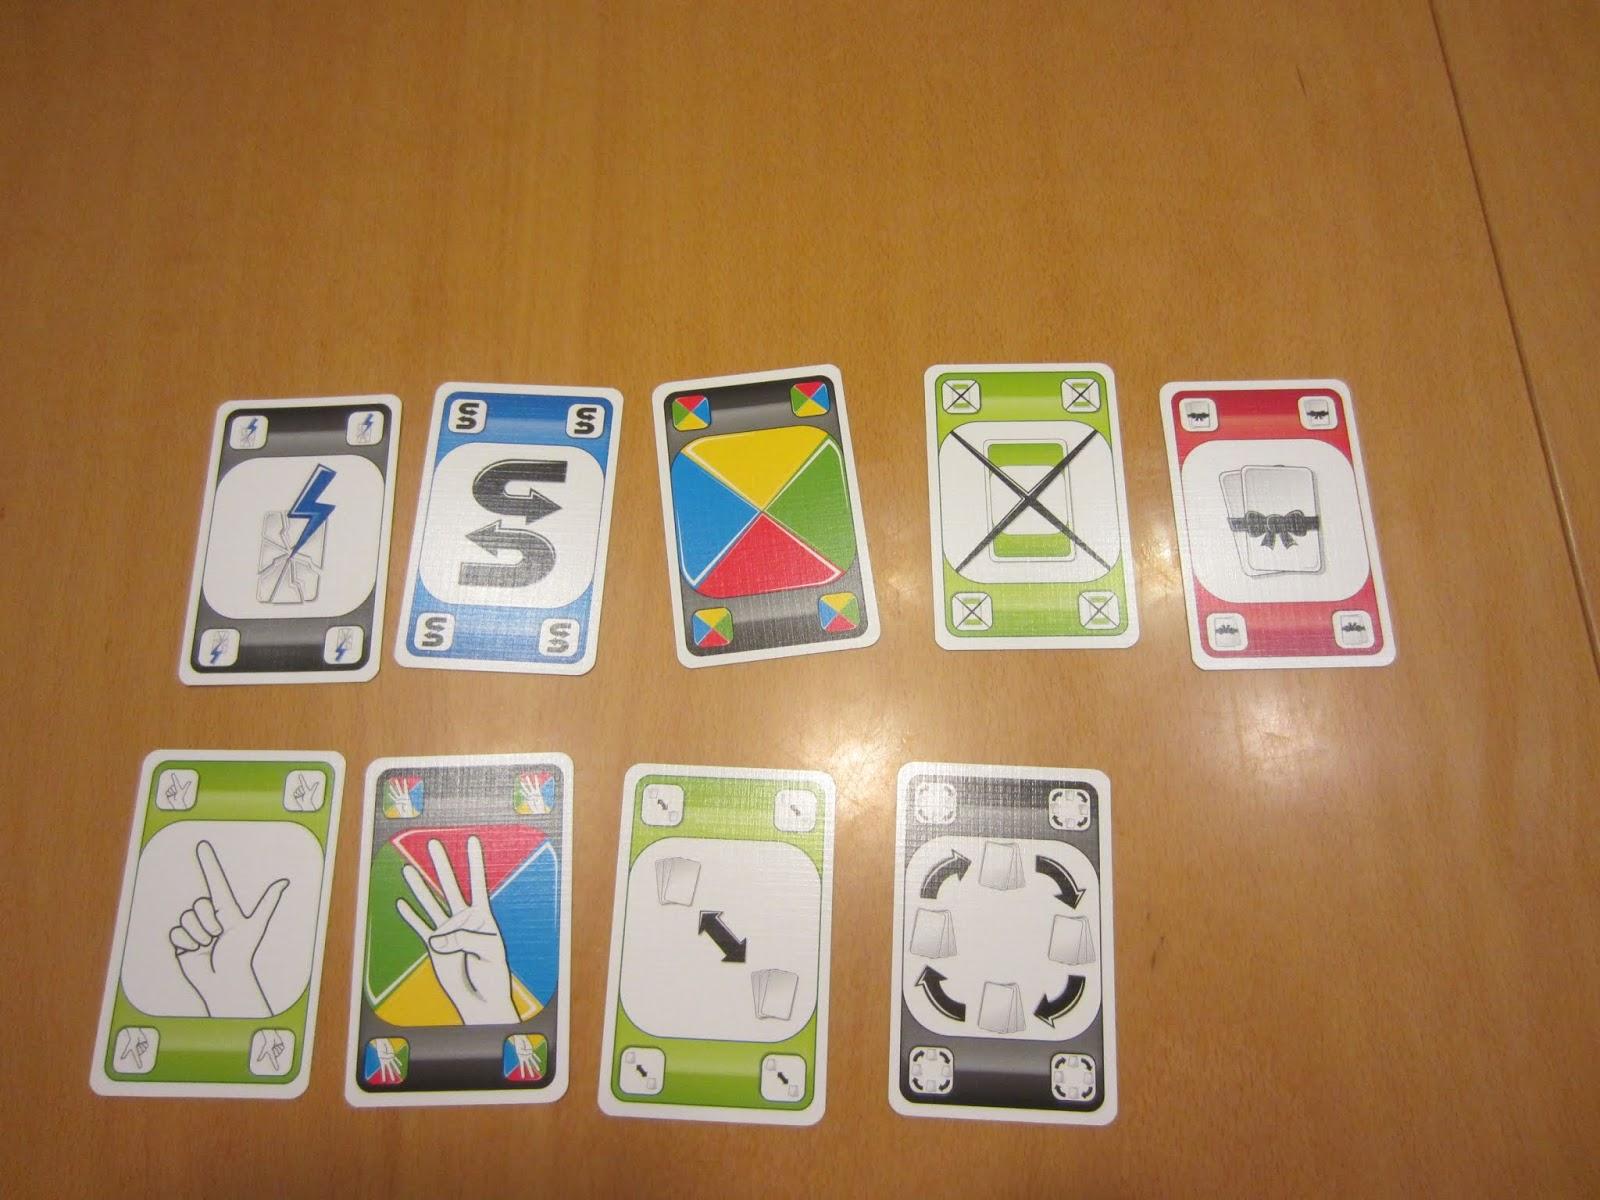 Tiggis Welt: Solo - das lustigie Mau-Mau Kartenspiel von AMIGO